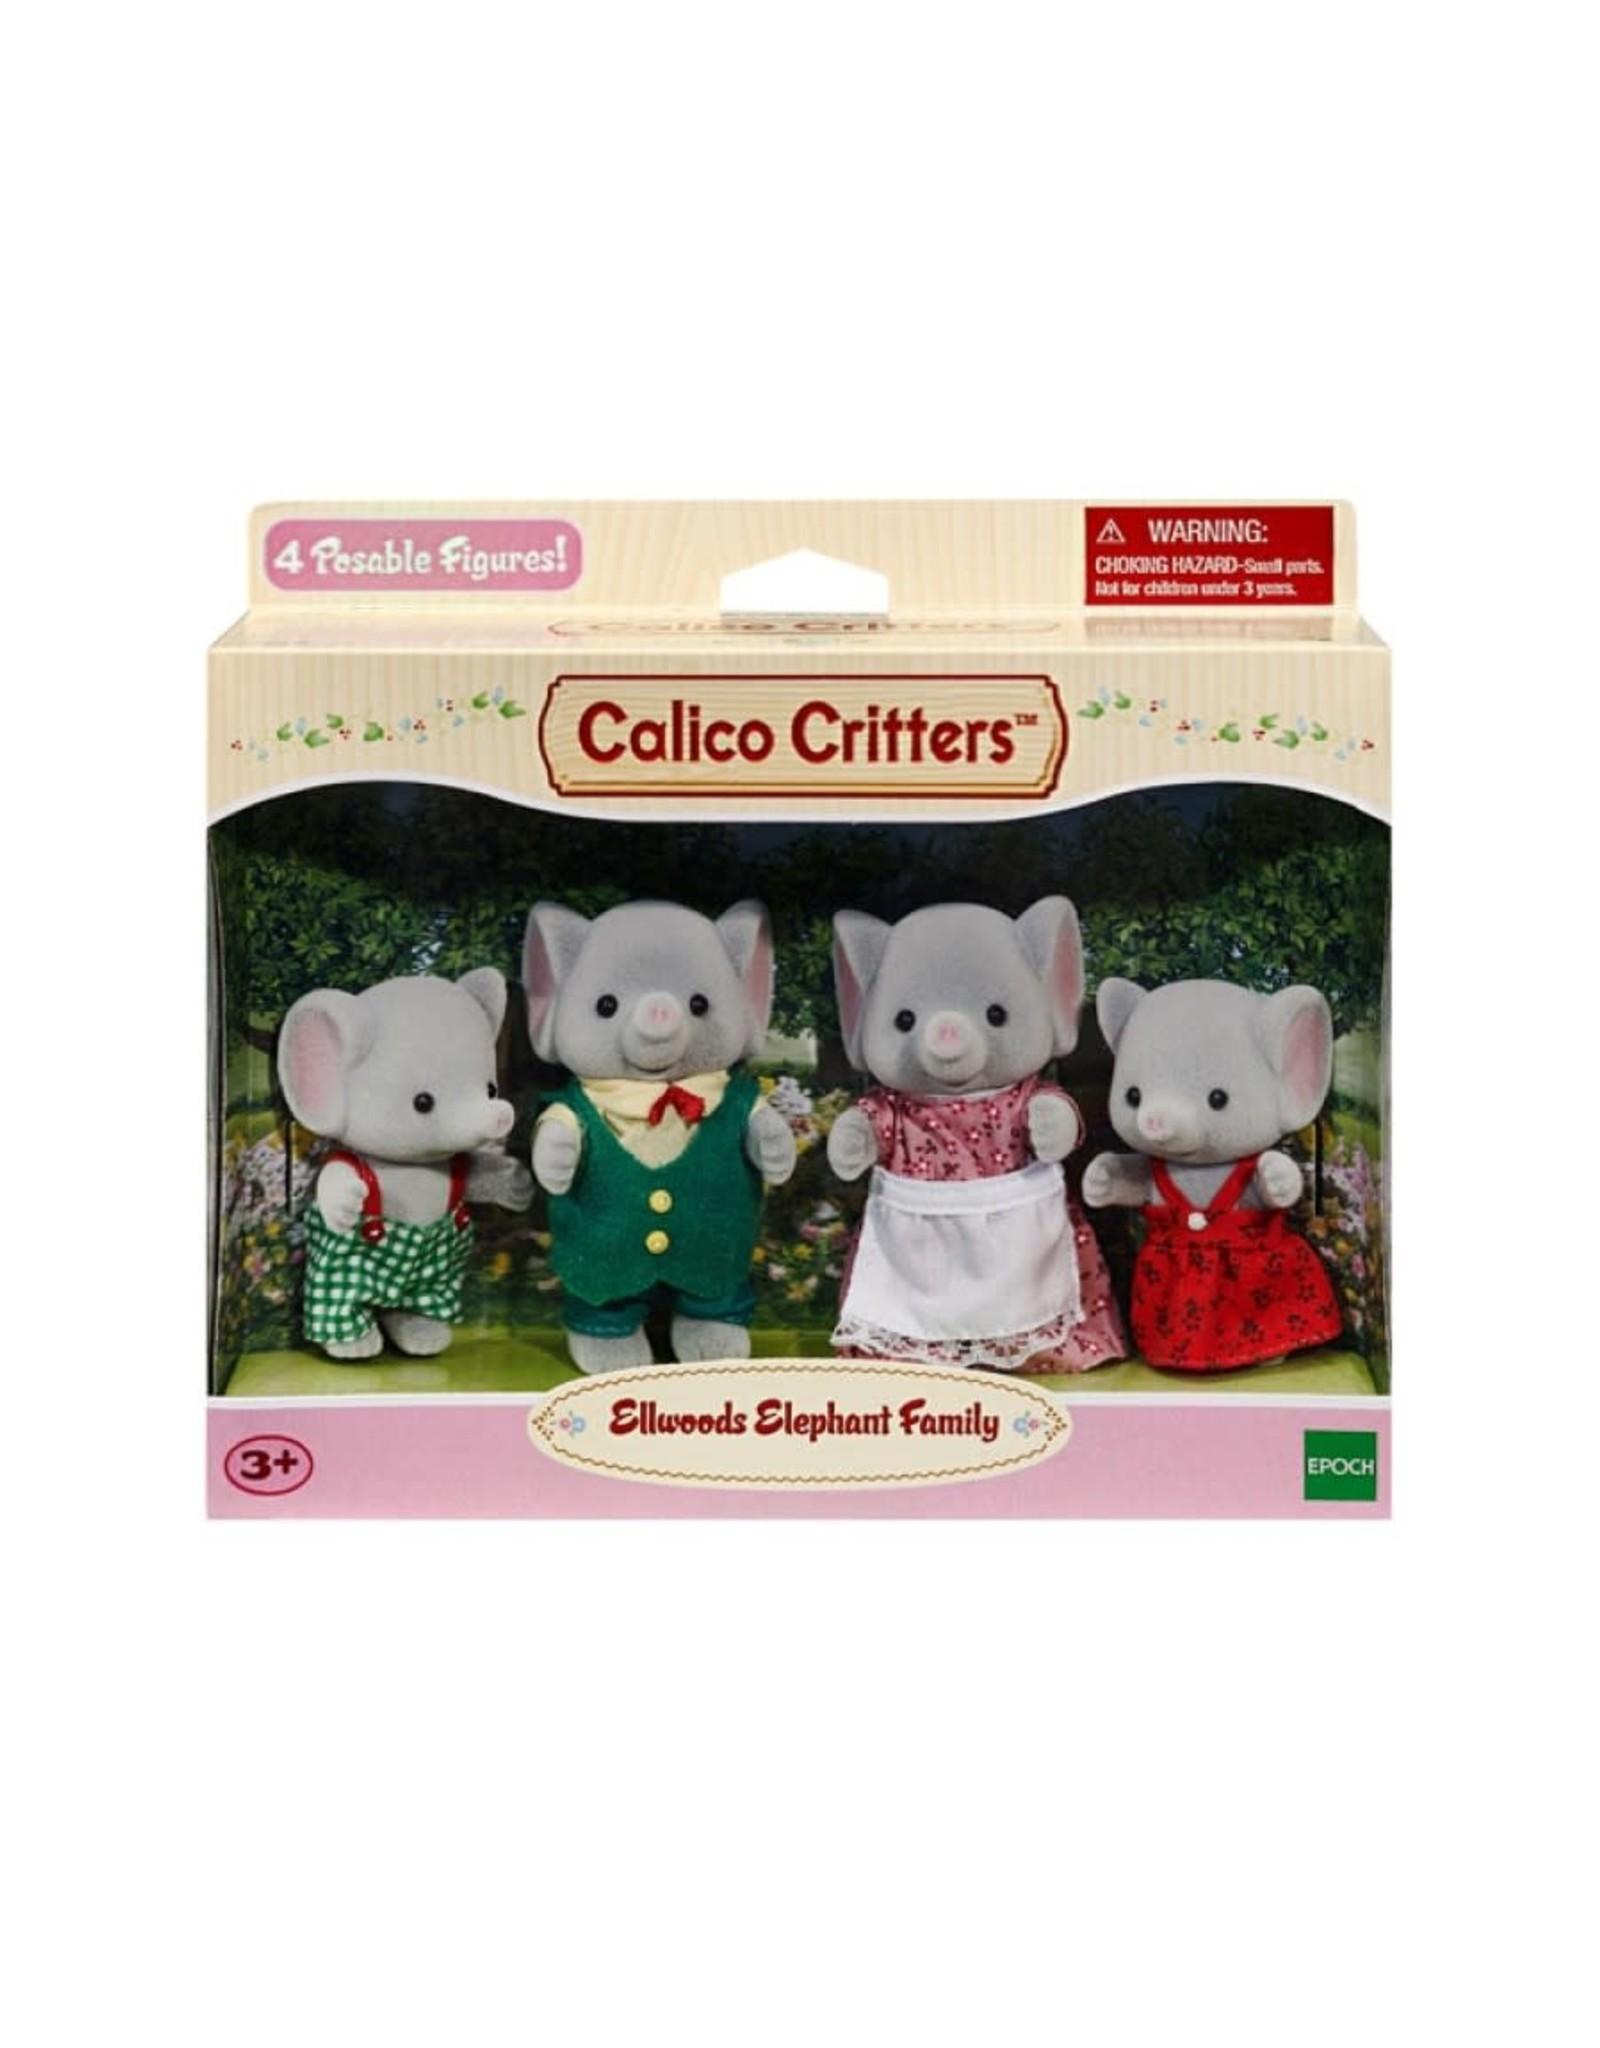 Calico Critters CC Ellwoods Elephant Family